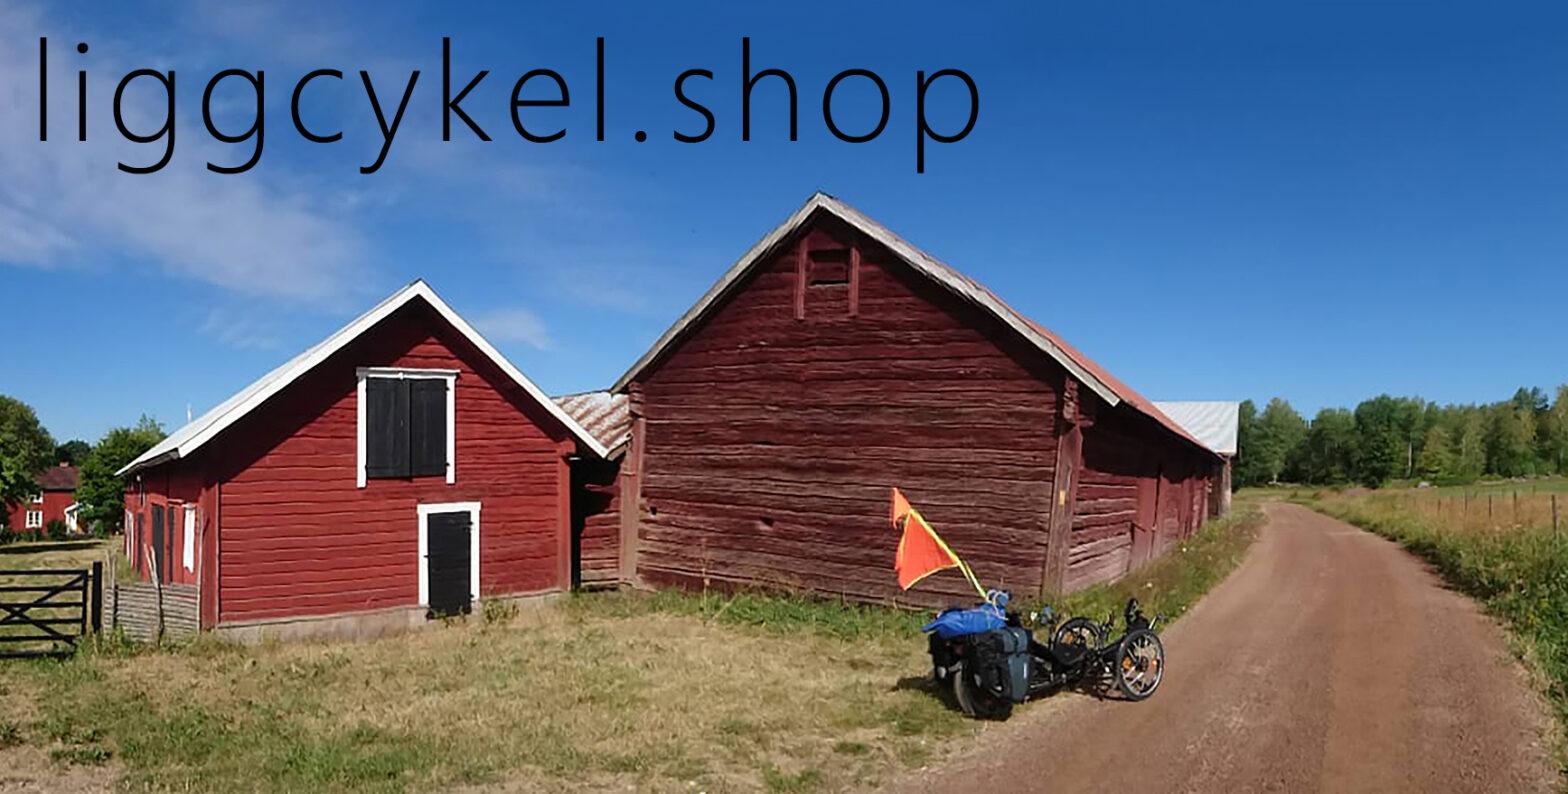 liggcykel.shop